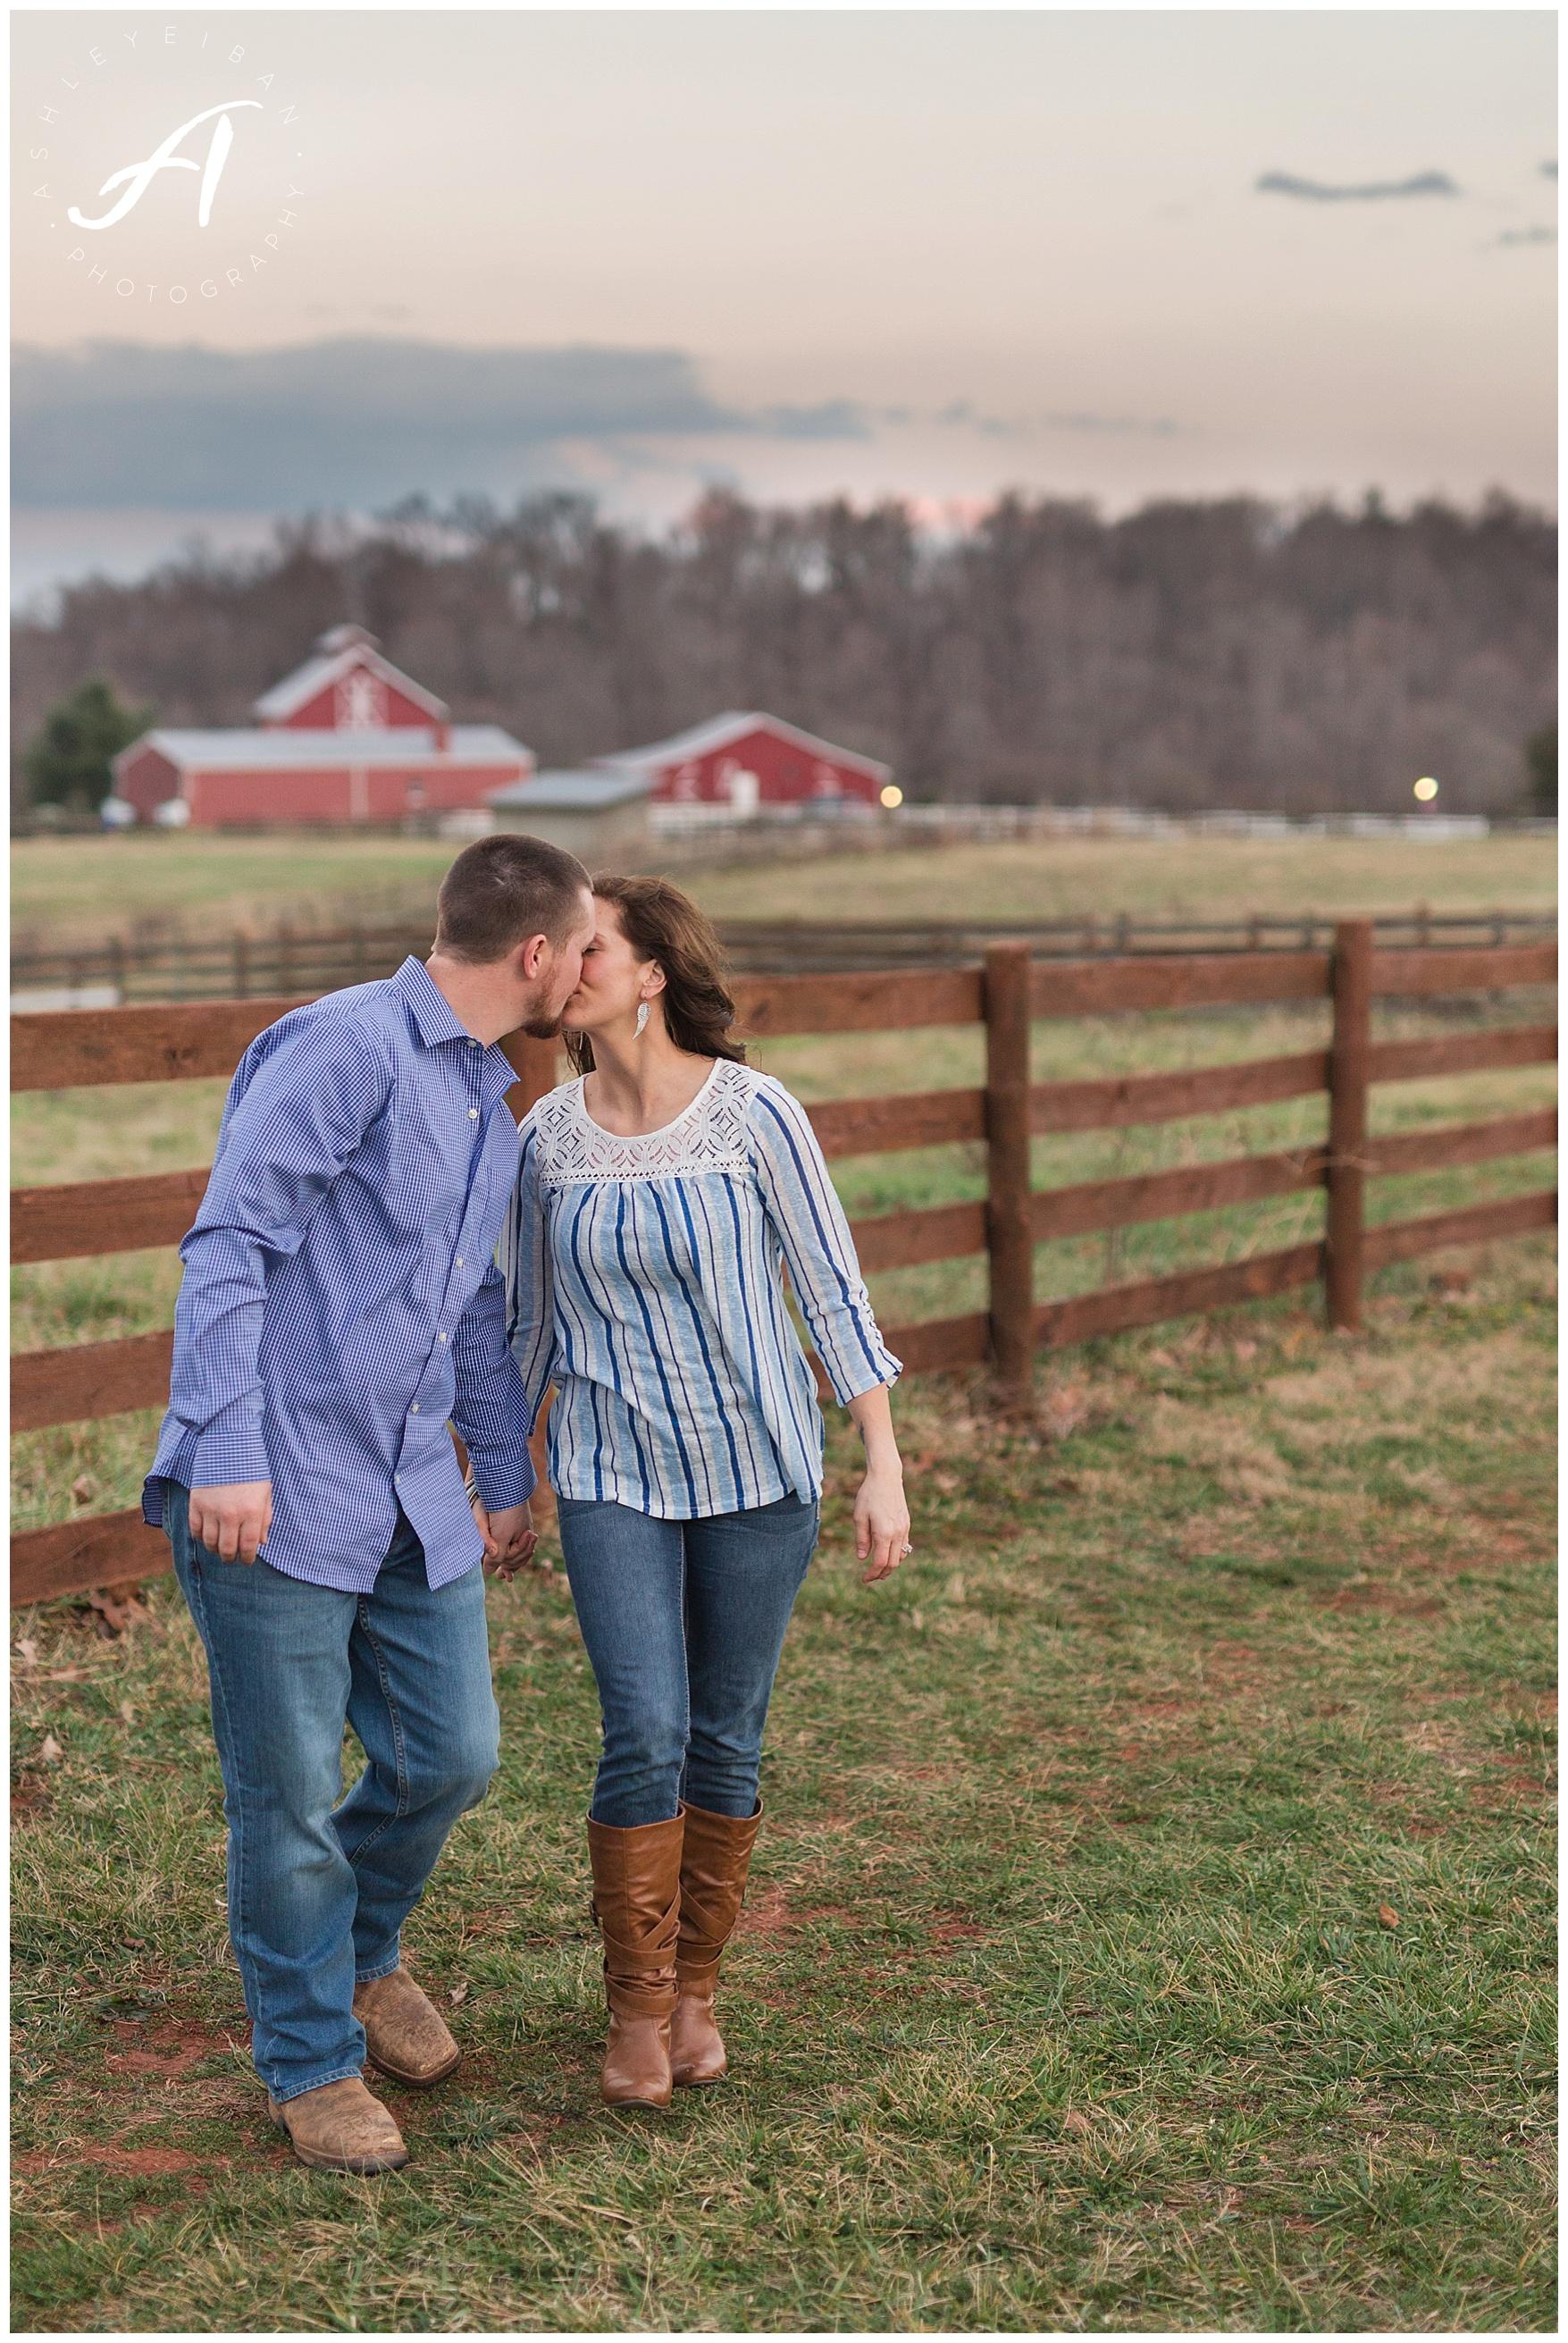 Lynchburg Virginia Wedding and Engagement Session || Charlottesville Wedding Photographer || Ashley Eiban Photography || www.ashleyeiban.com